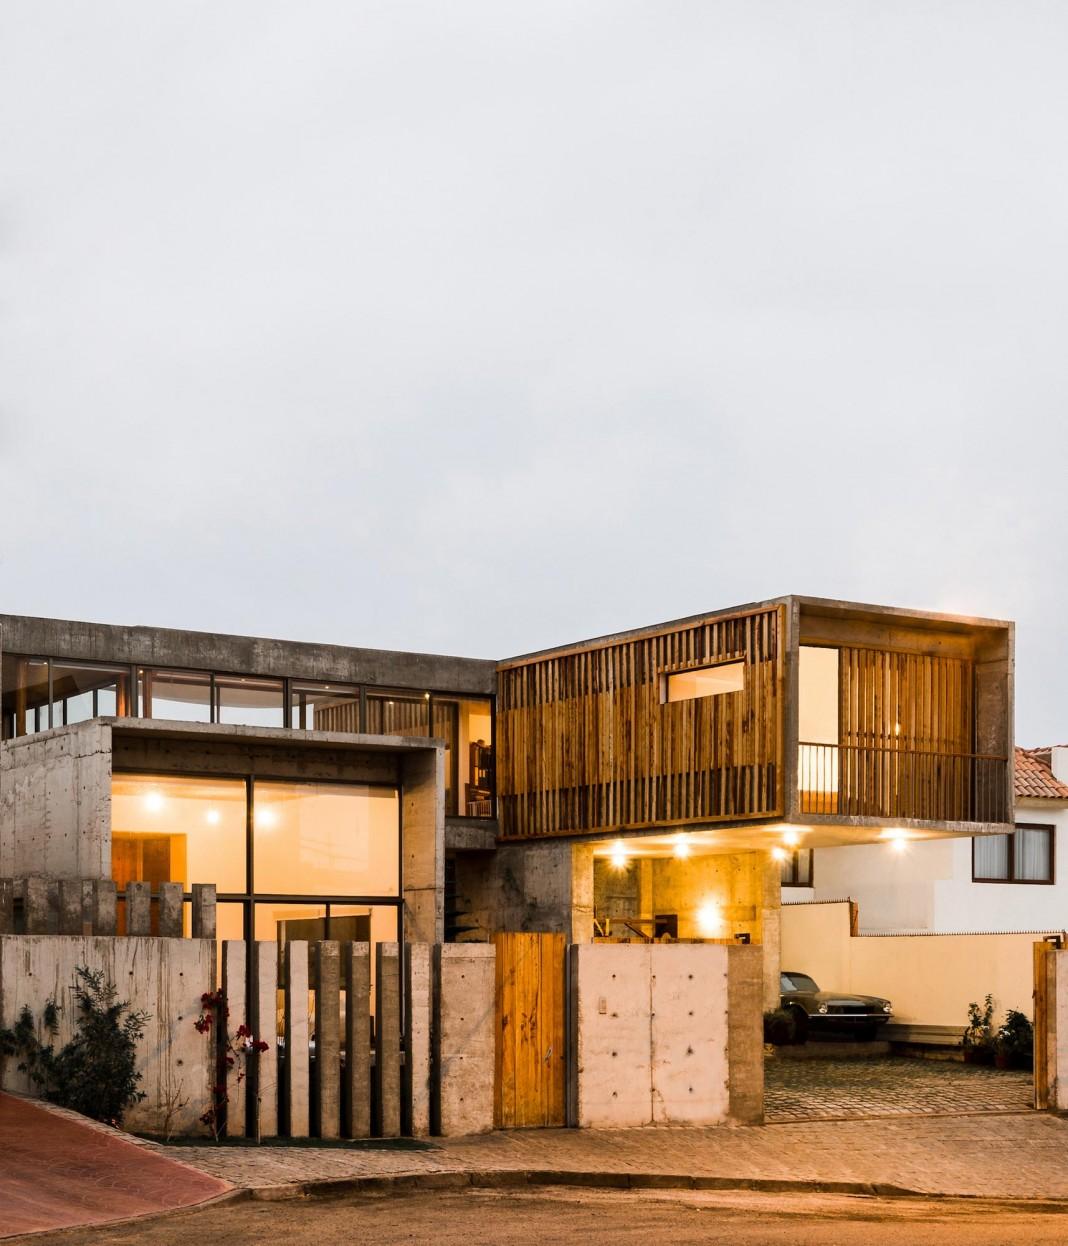 Jardines del Sur House by DX Arquitectos